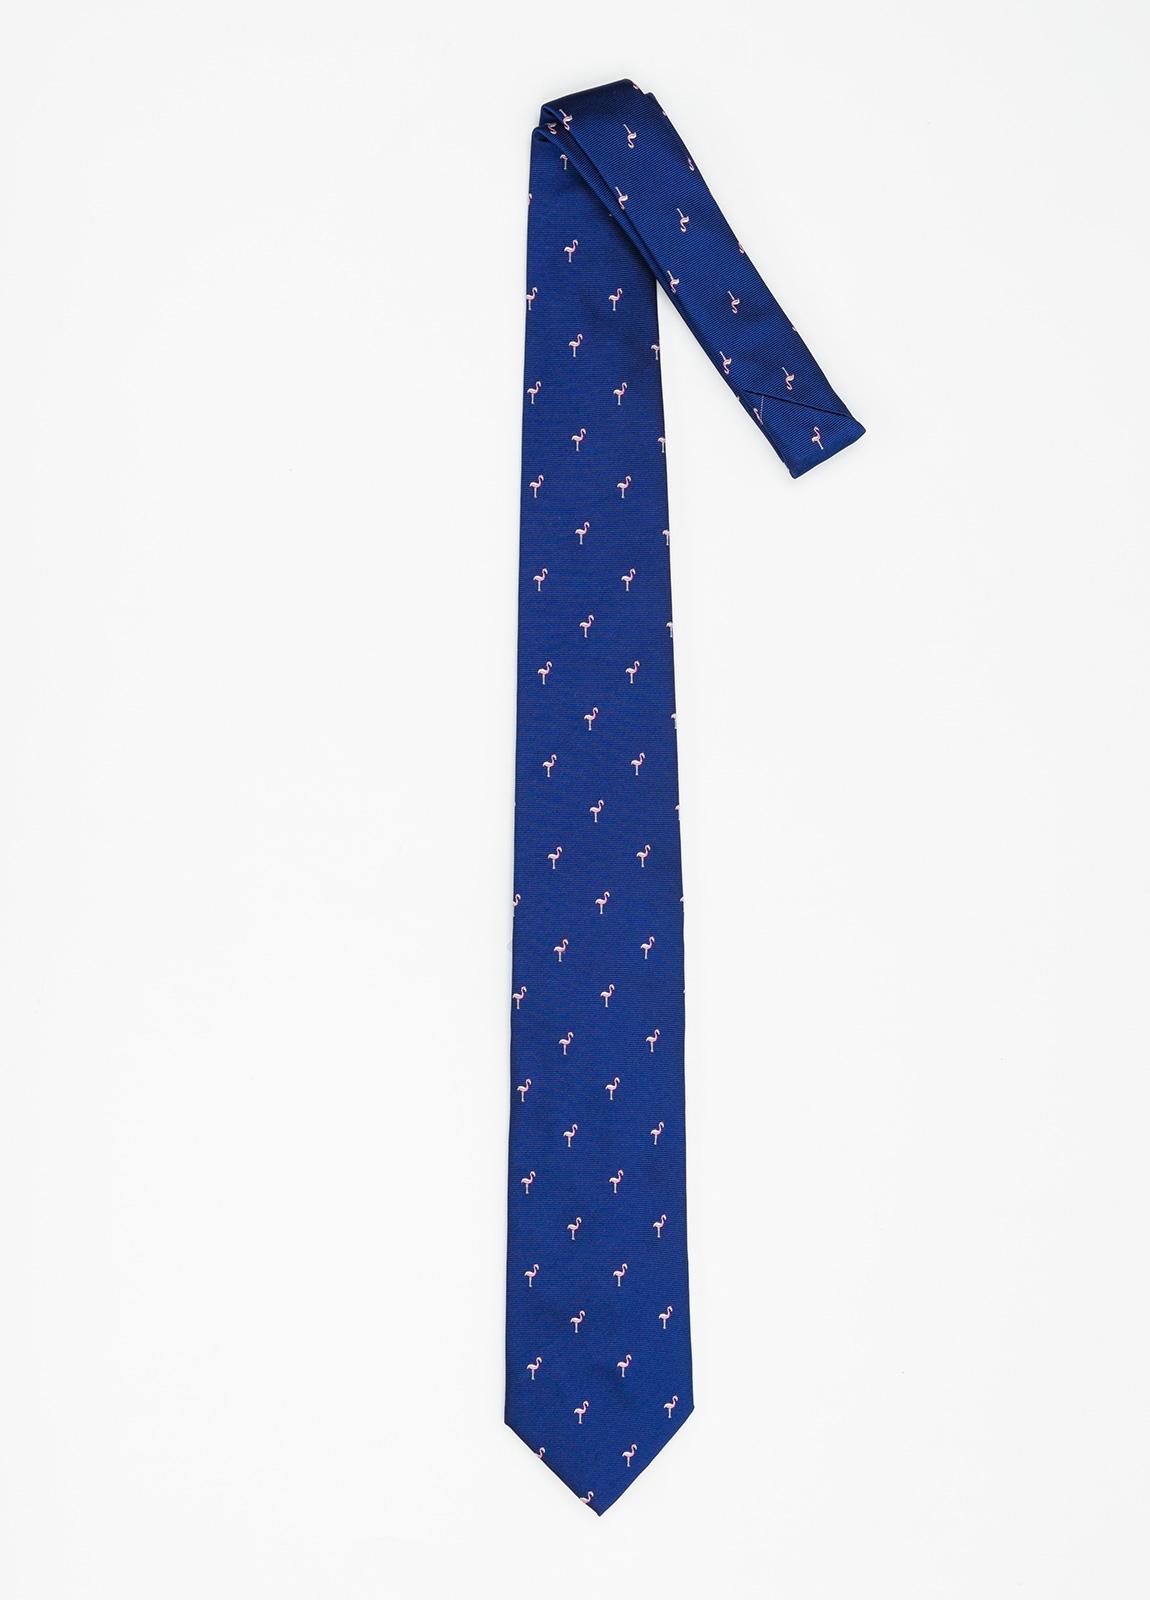 Corbata Formal Wear dibujo flamencos color azul. Pala 7,5 cm. 100% Seda. - Ítem1